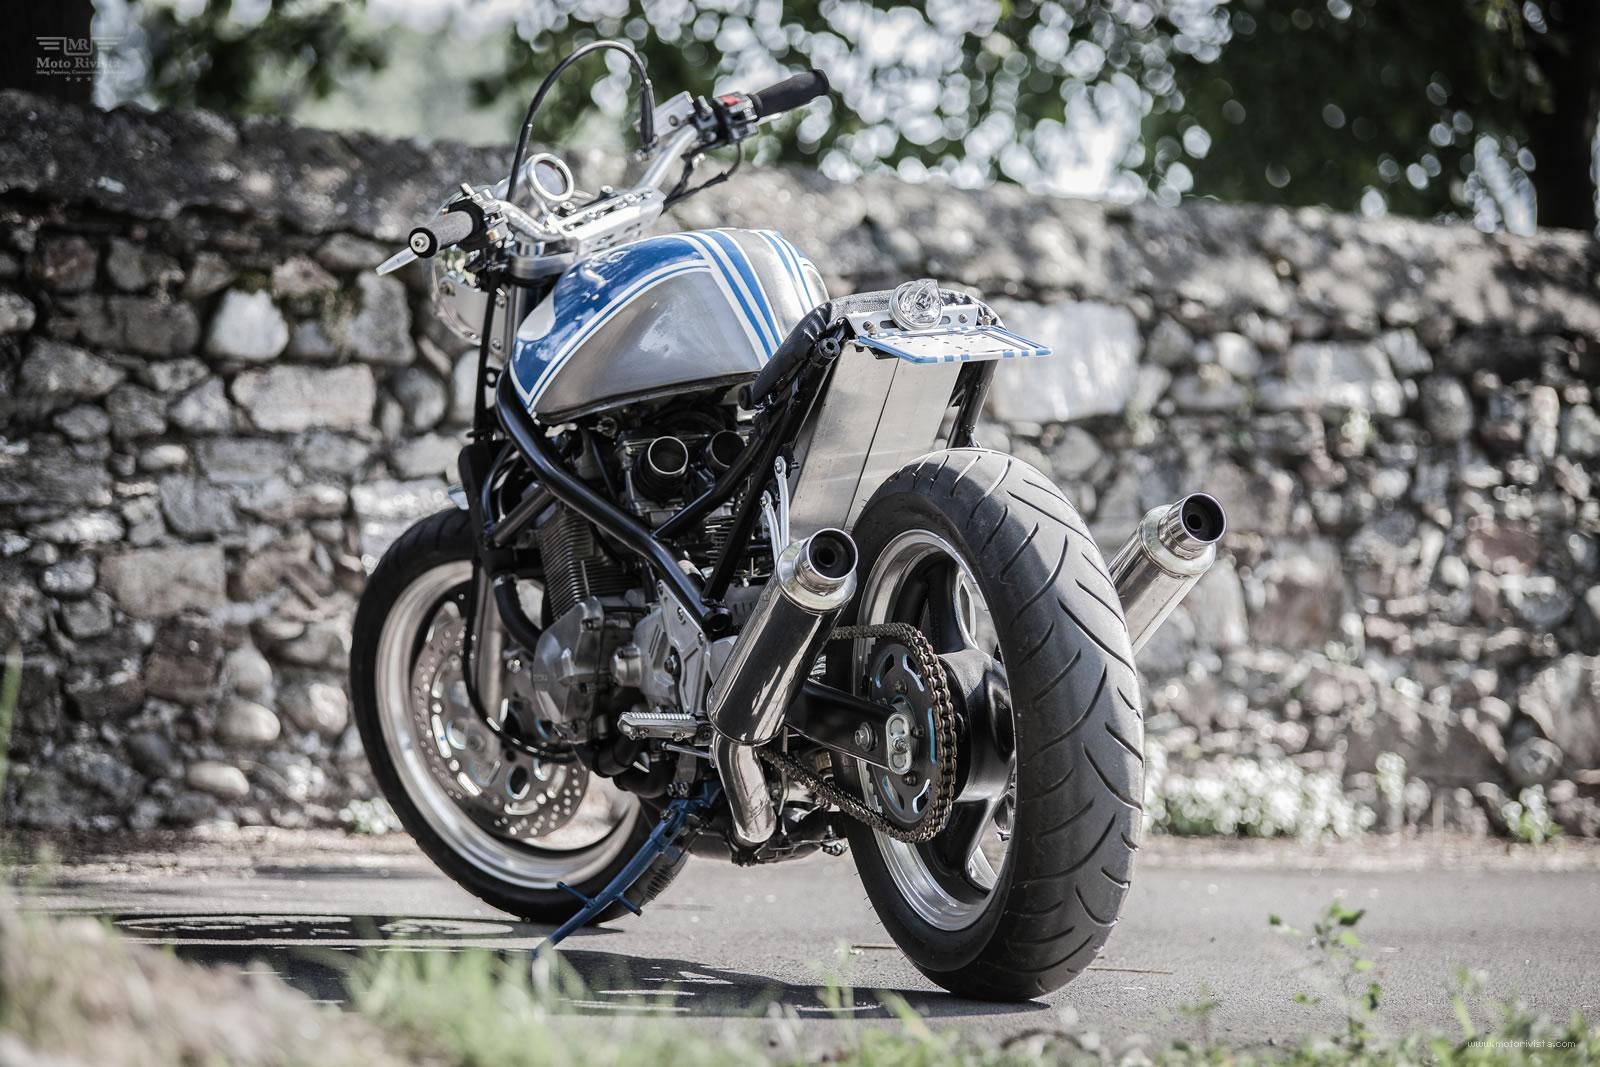 Bandits raras vistas por ahí (web) Italian-custom-Suzuki-GSF400-2